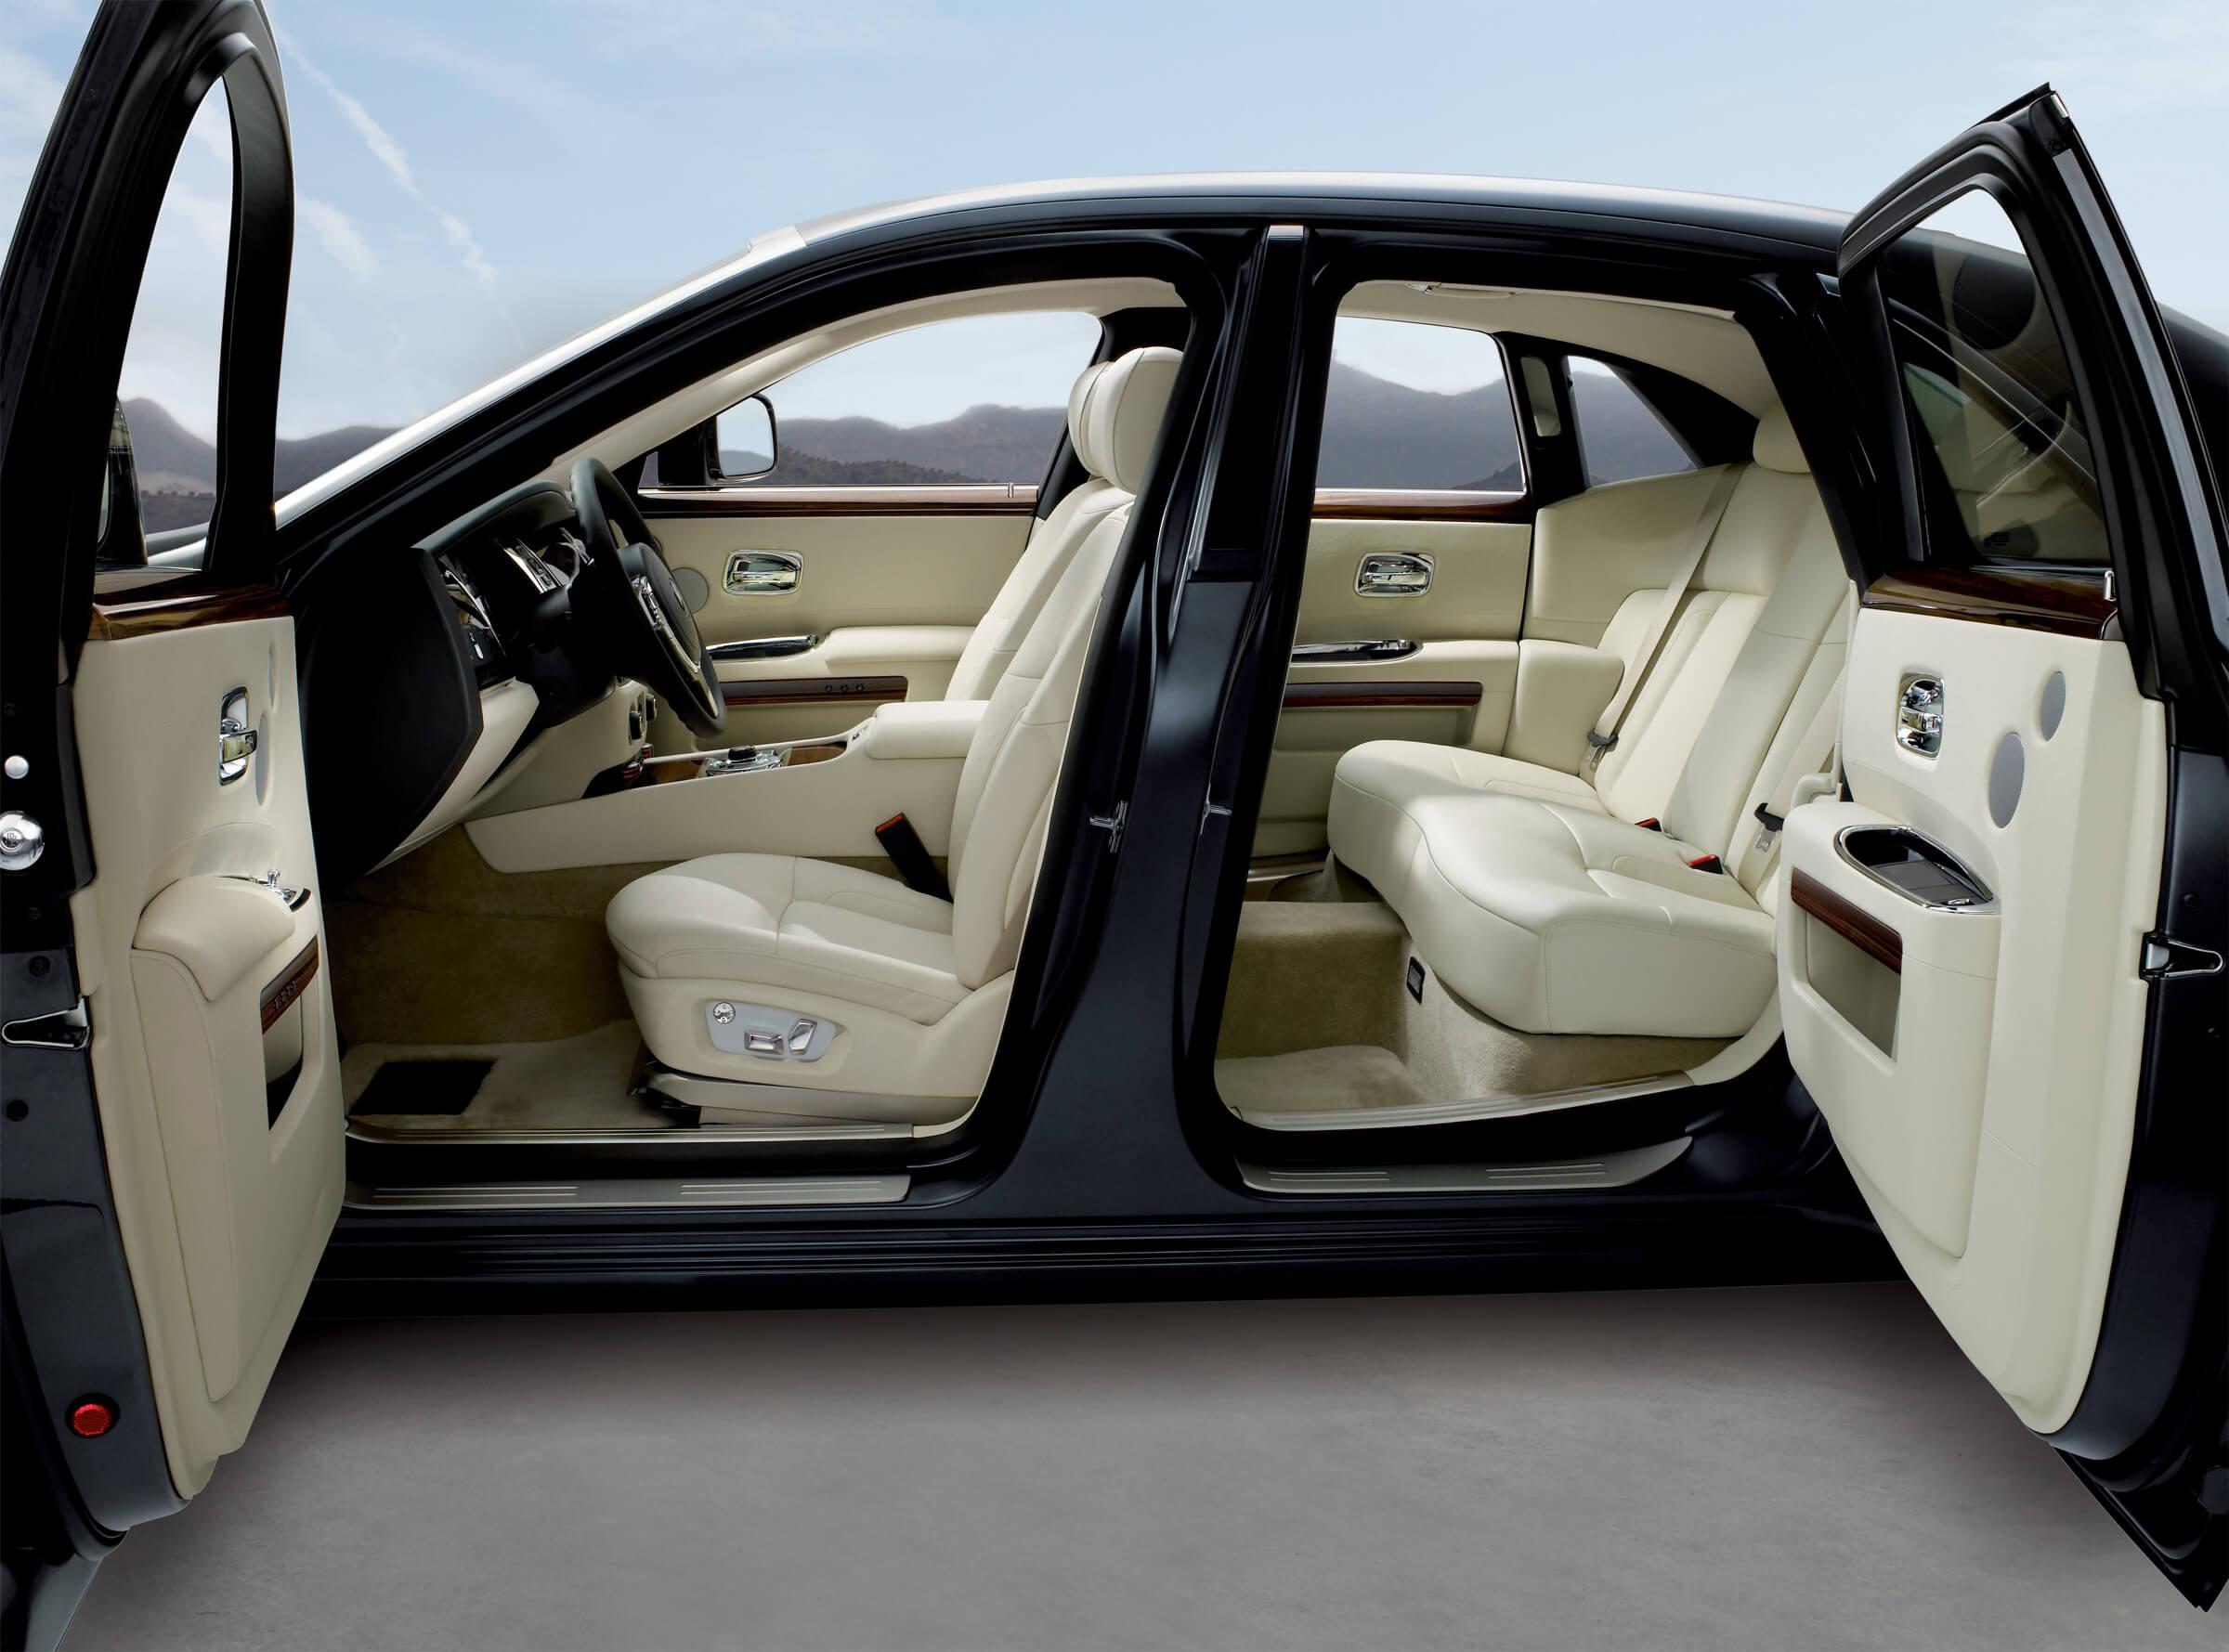 Rolls Royce Phantom Best Luxury Cars: Ghost Revives UK Luxury Car Brand: Record Sales For Rolls